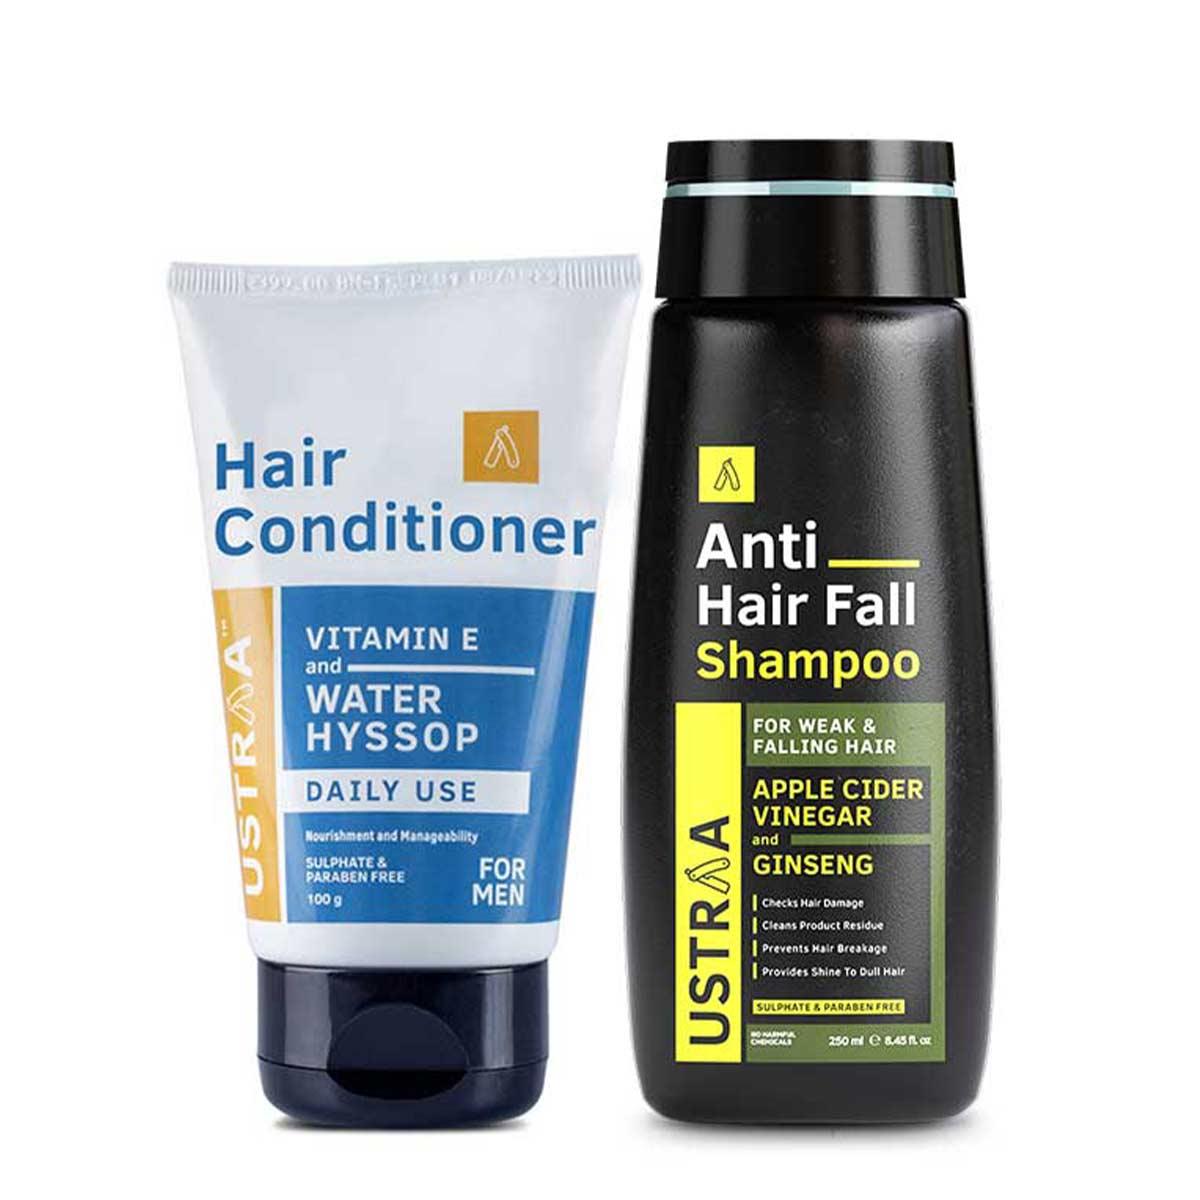 Anti Hair Fall Shampoo & Conditioner